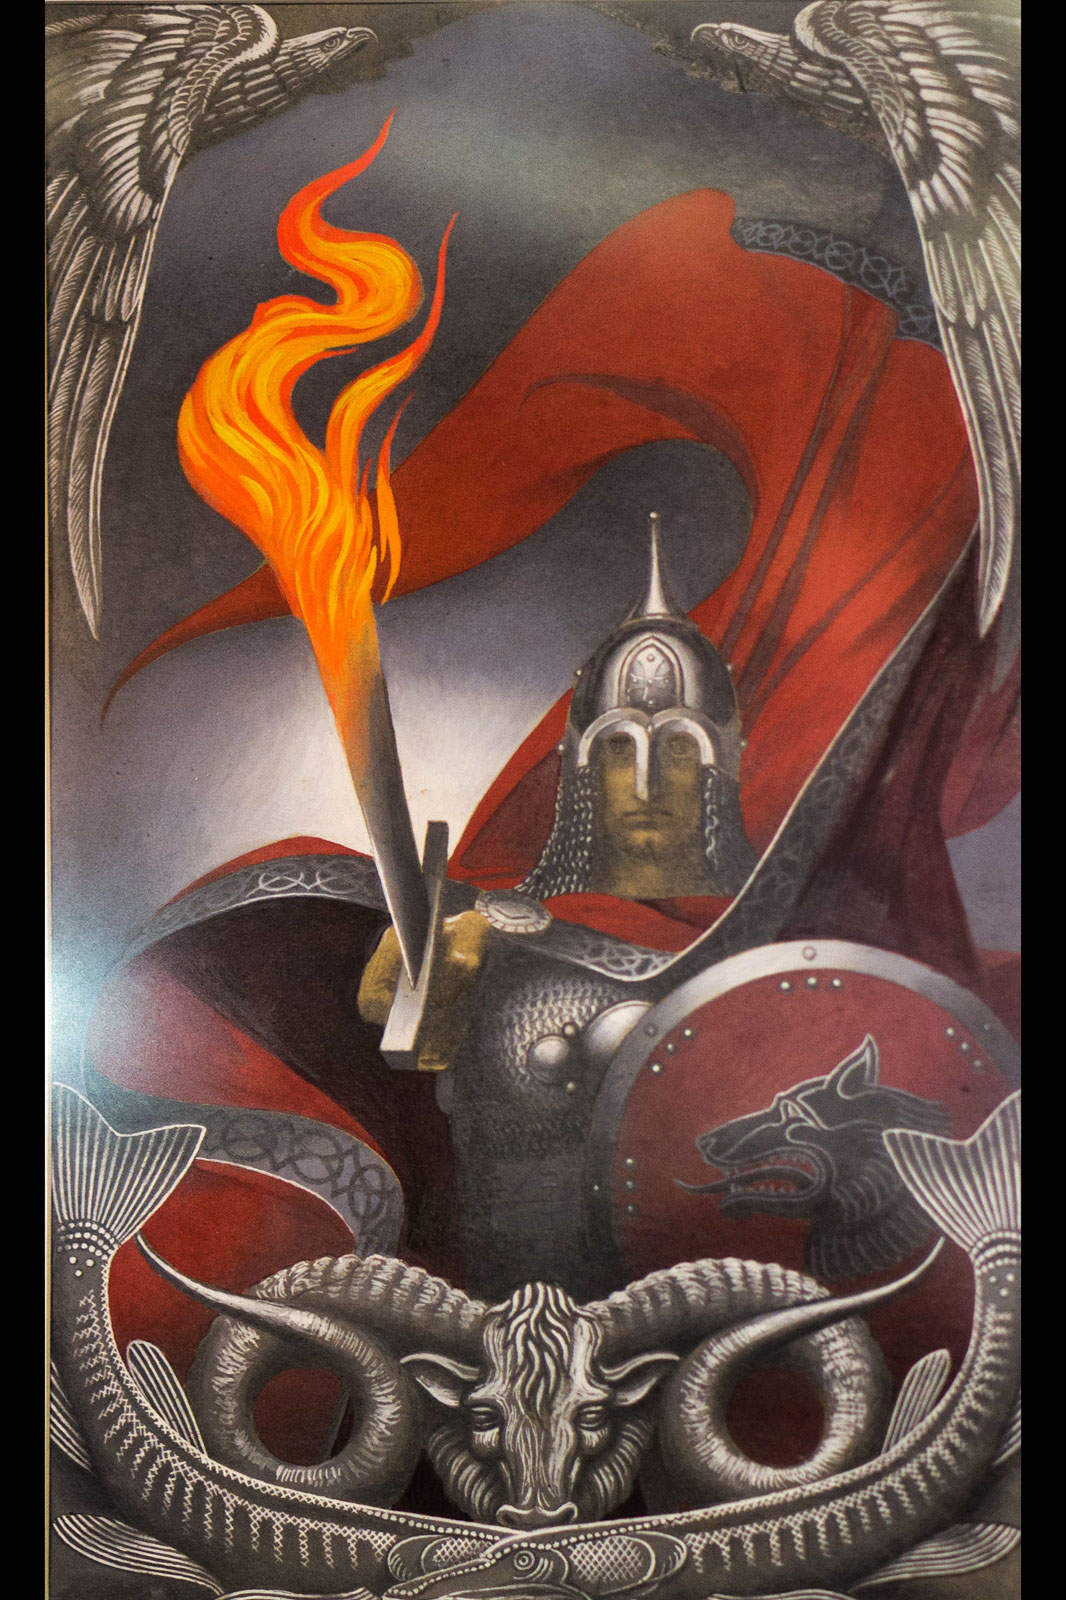 Фото №113664. Огненный меч (Вольга). 1974. Константин Васильев (1942-1976)